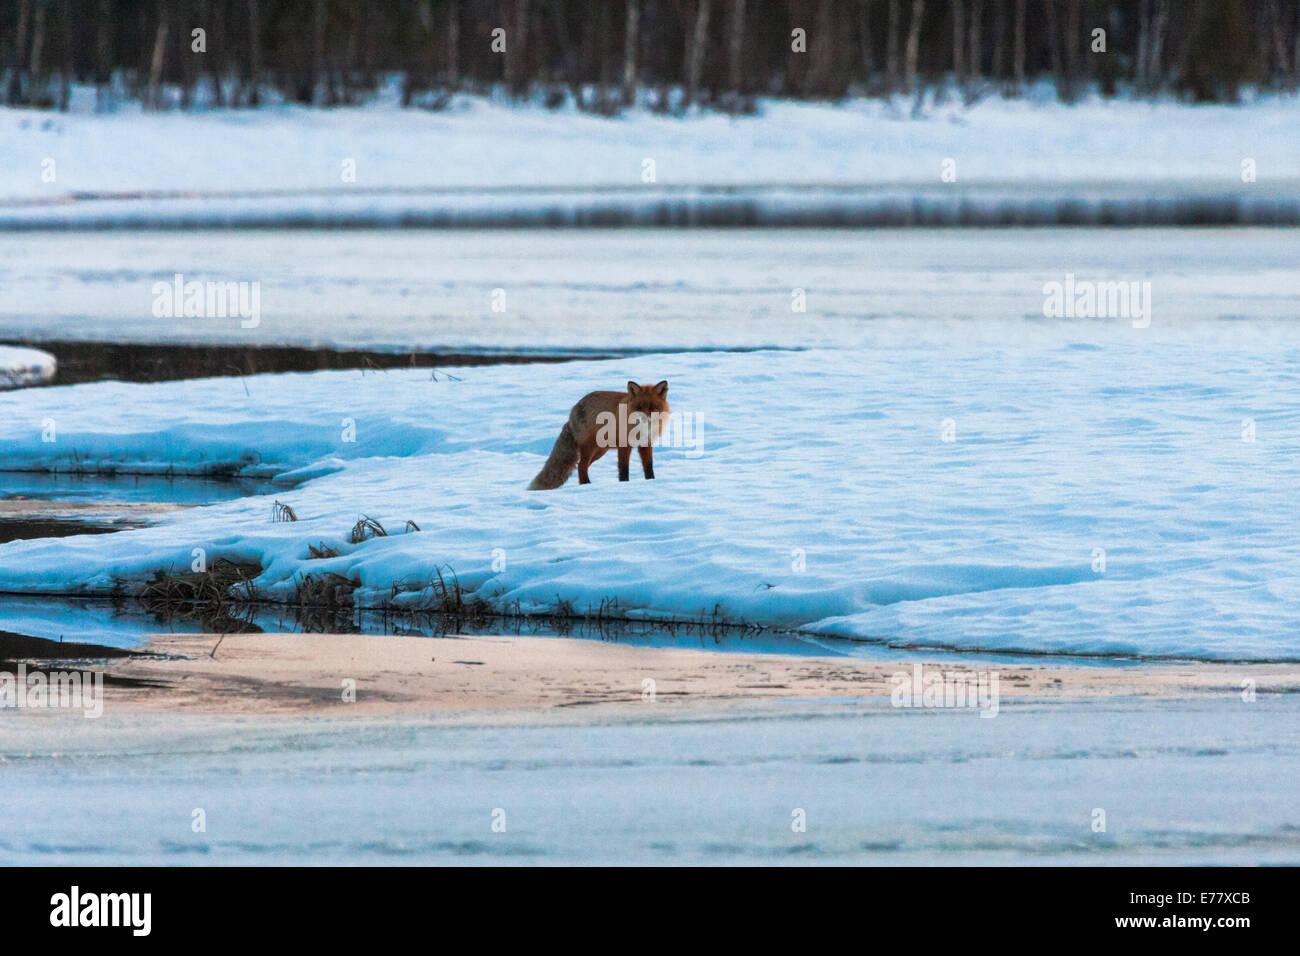 Redfox in winter landscape - Stock Image